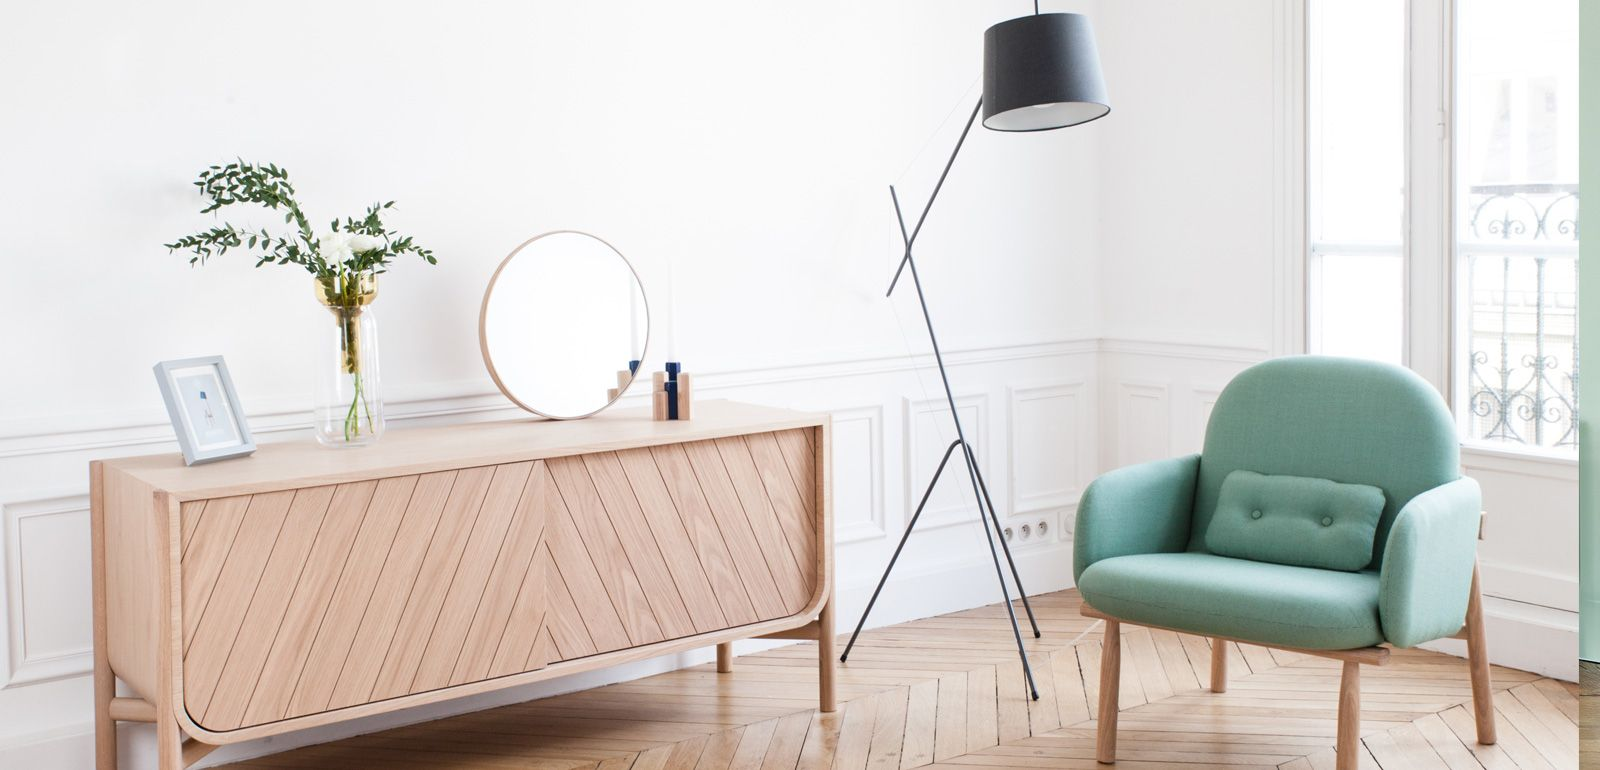 nouvelle collection harto sur silvera eshop silvera. Black Bedroom Furniture Sets. Home Design Ideas